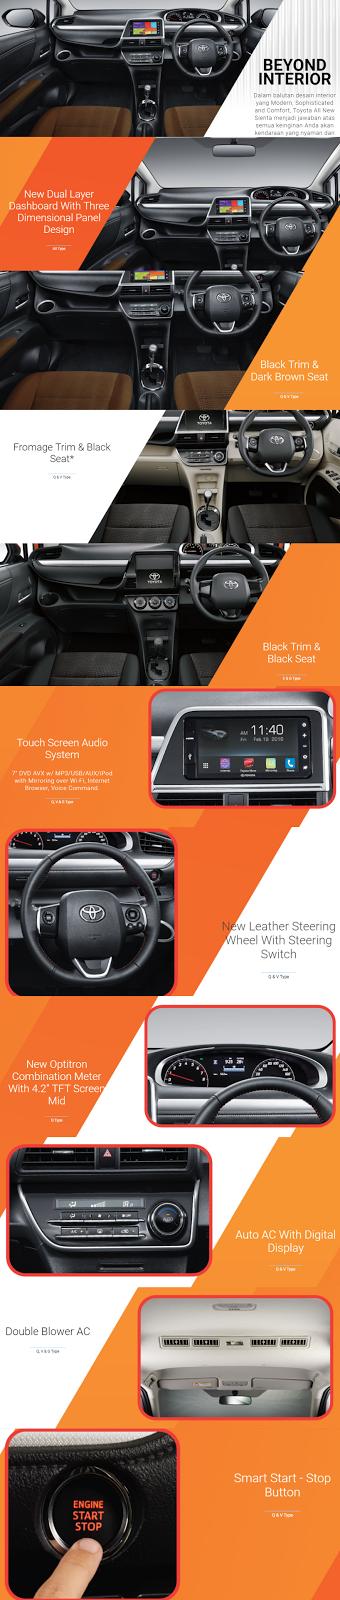 interior-mobil-all-new-Sienta